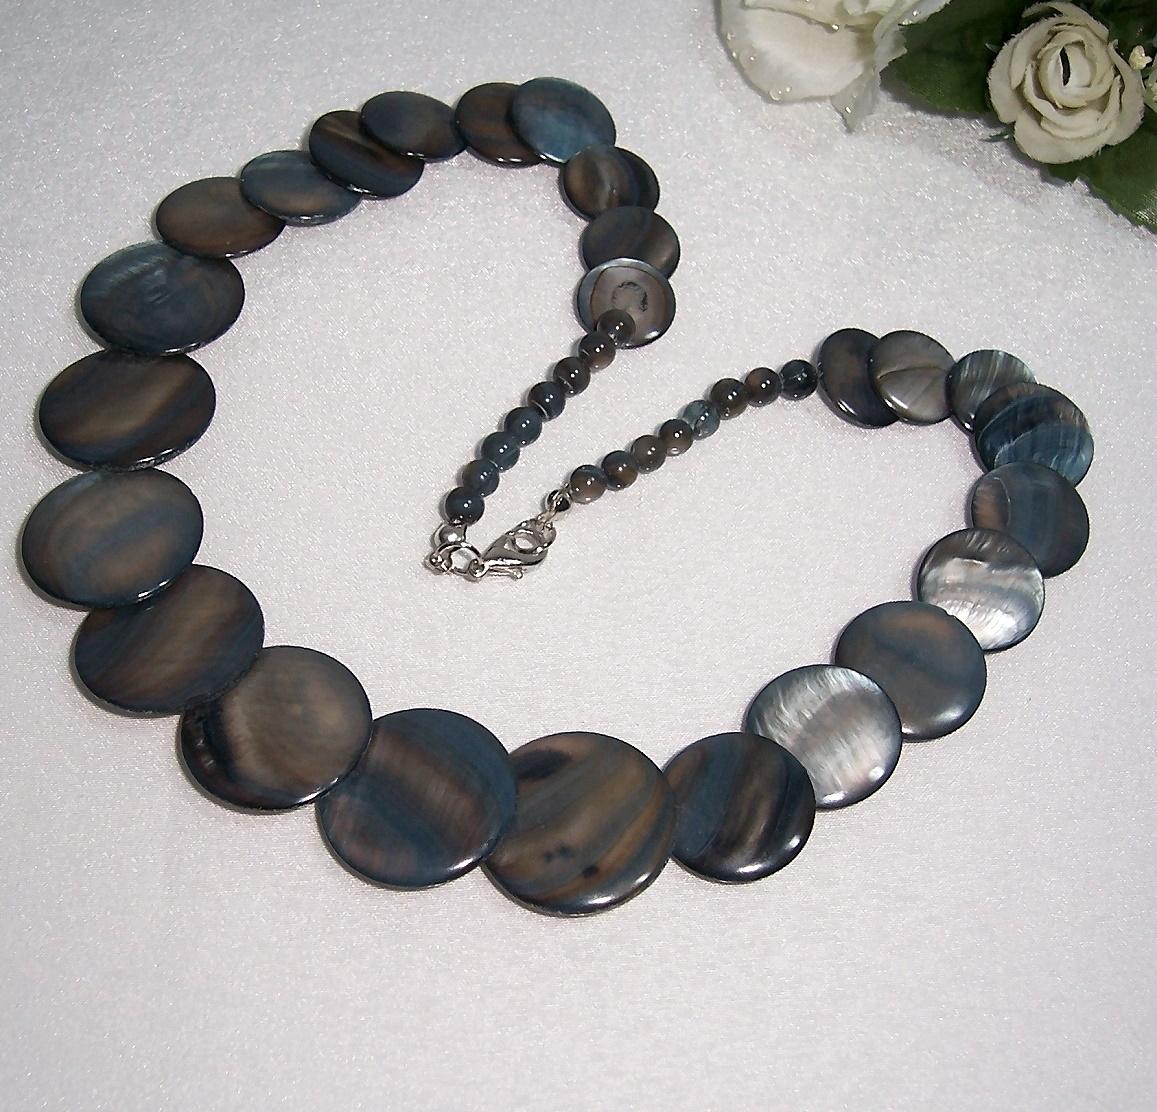 Schmuck Kette Collier Halskette Perlmutt grau Perlenkette Damen K1852